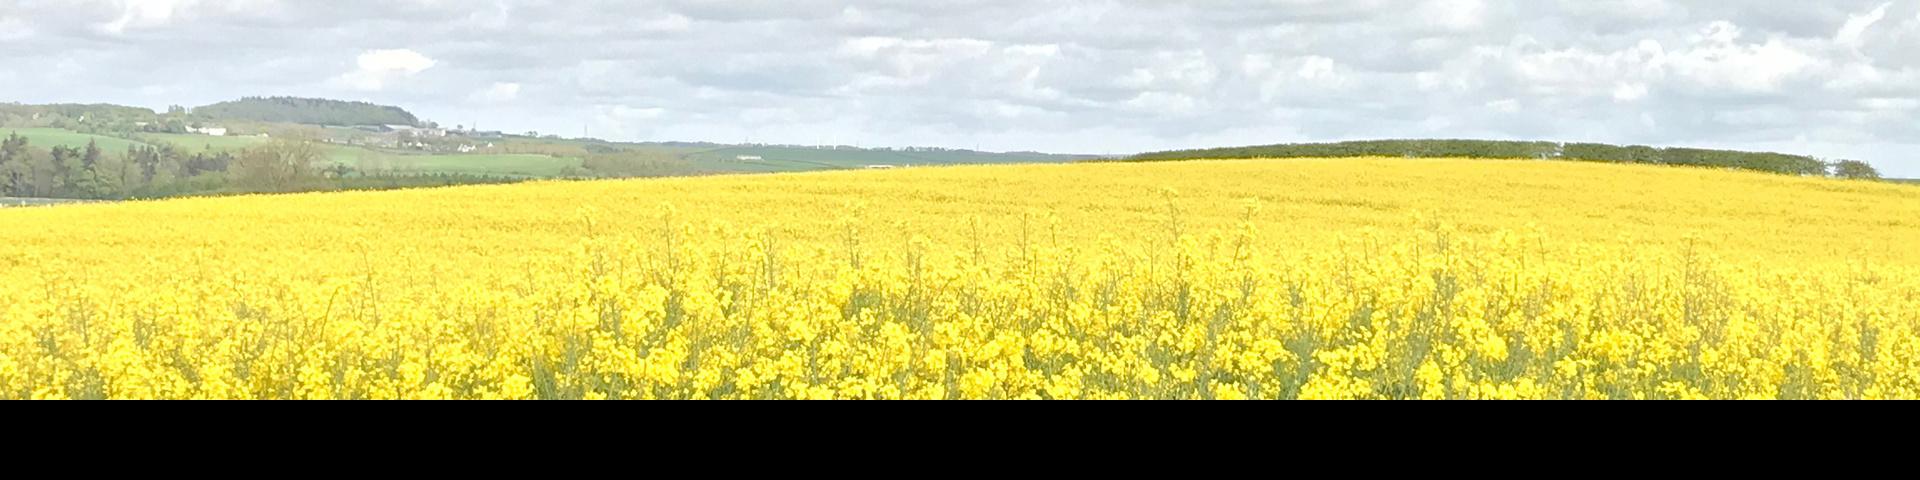 Field of yellow rapeseed